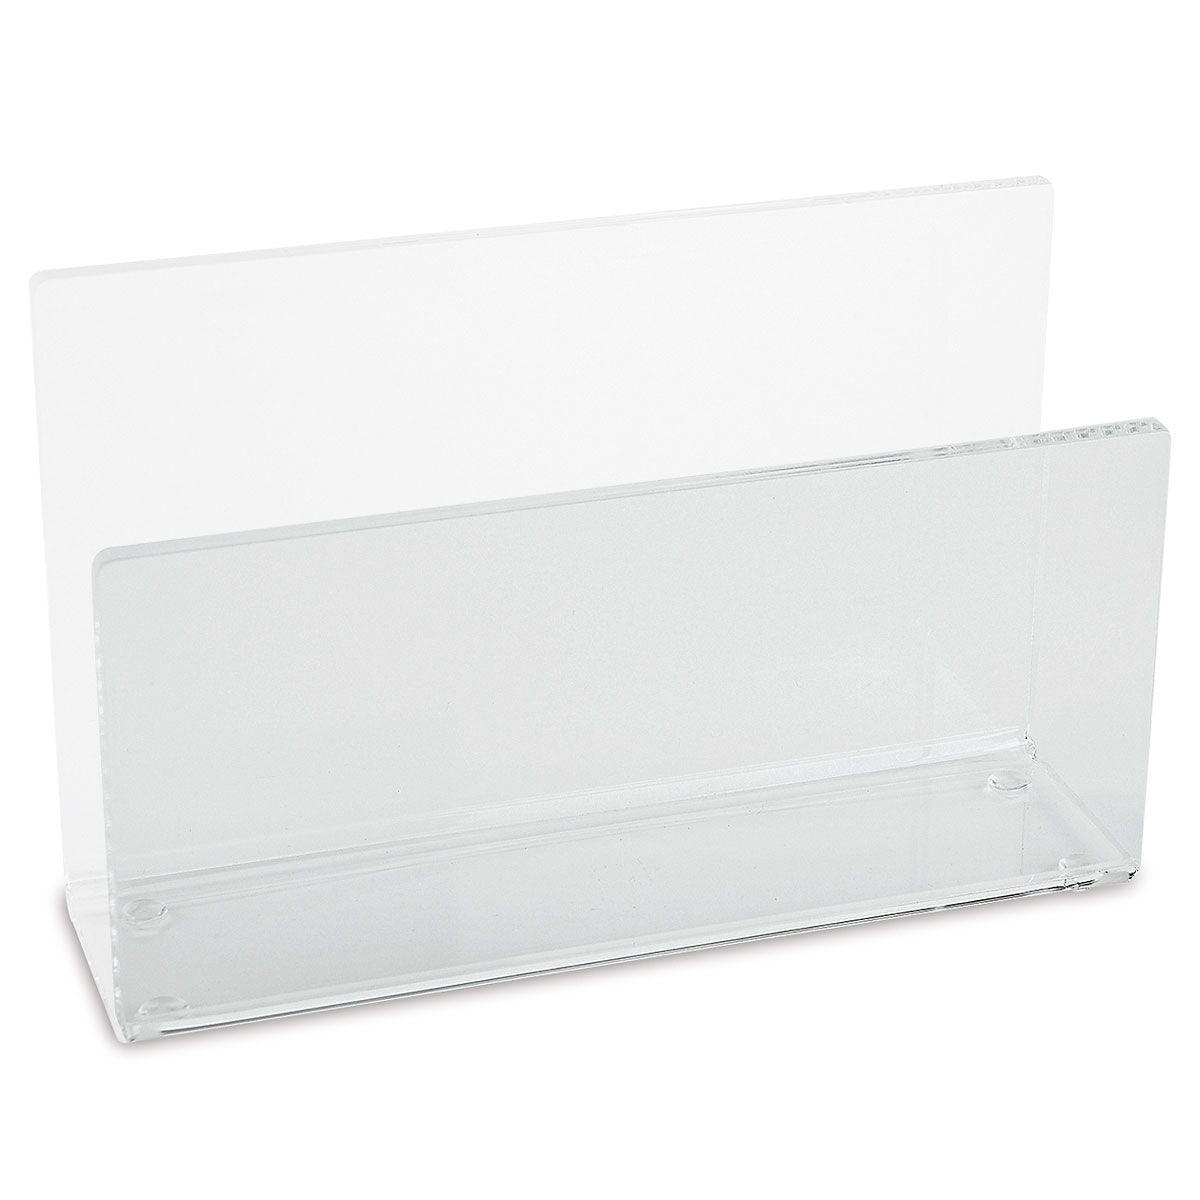 Acrylic Upright Note Pad Holder